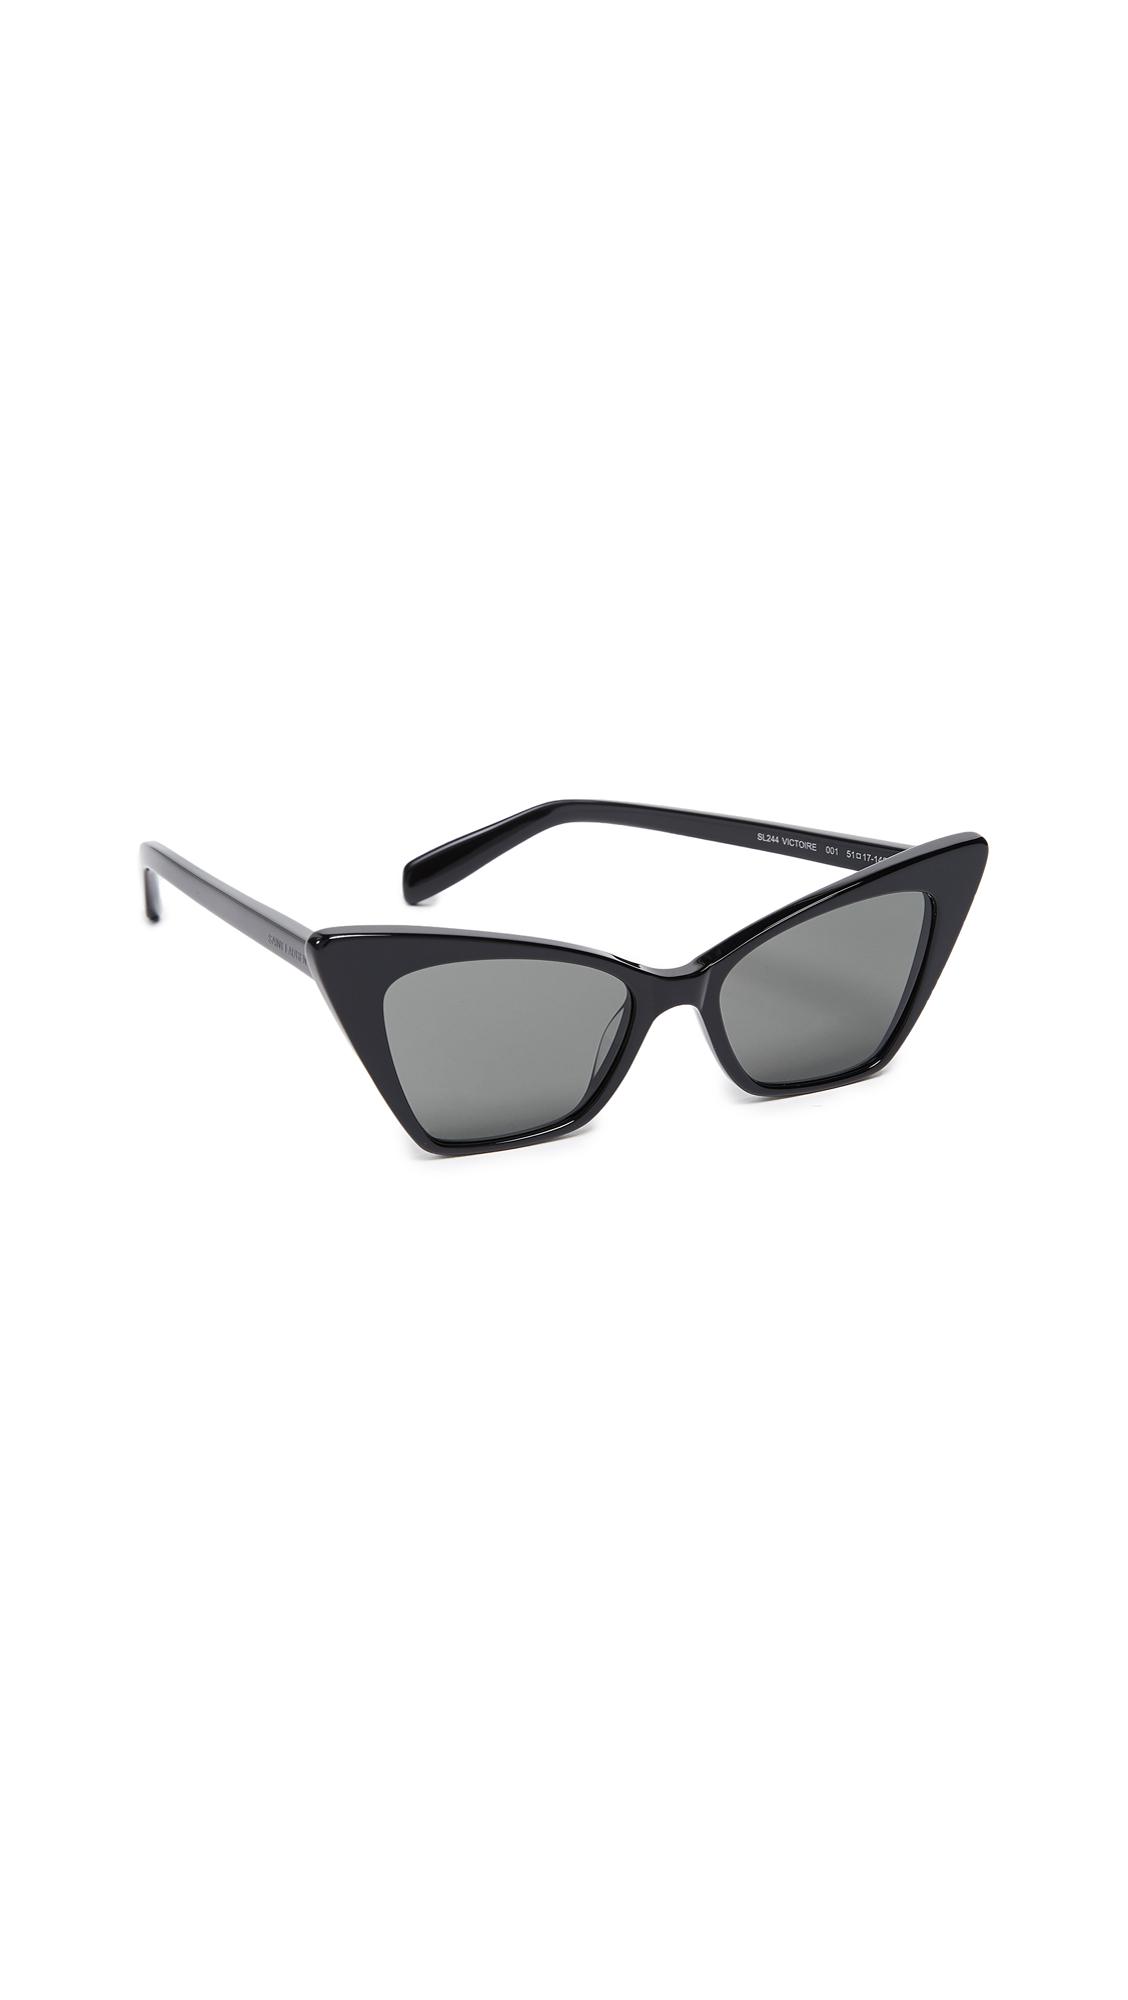 Saint Laurent Cateye Sunglasses In Black/Solid Grey